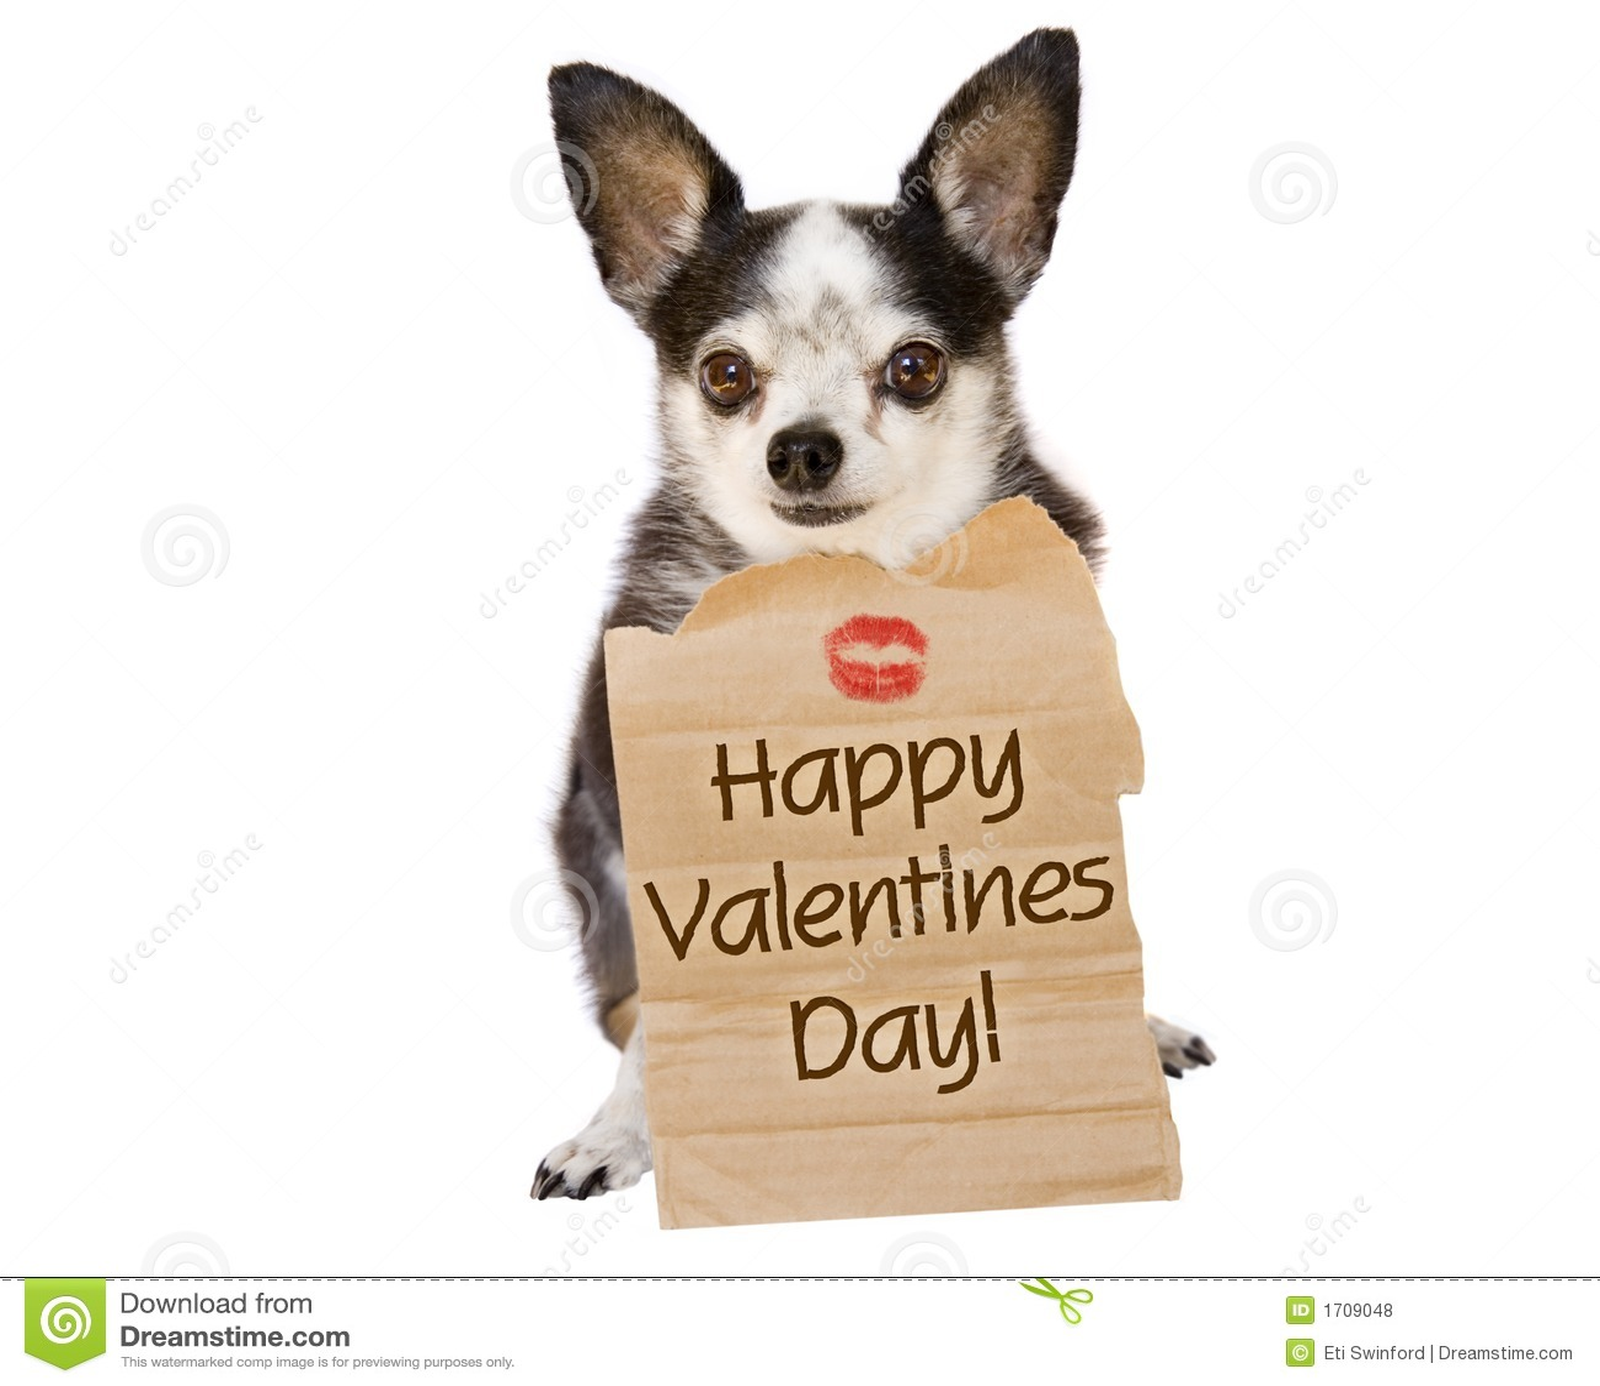 Valentines day dog kiss